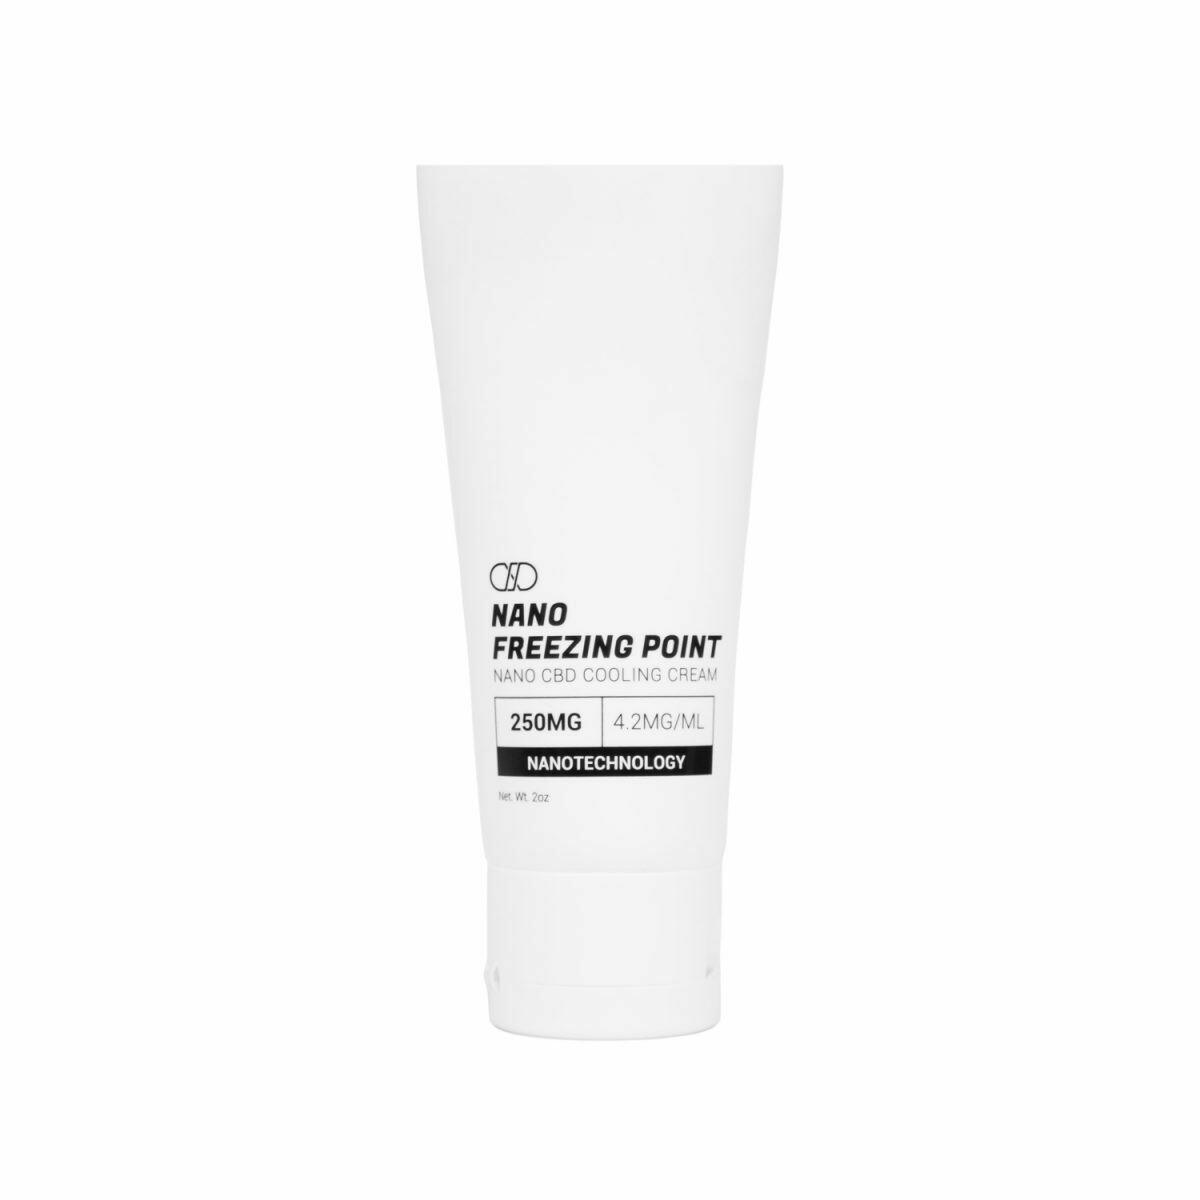 Infinite NANO Freezing Point Cream 250 mg